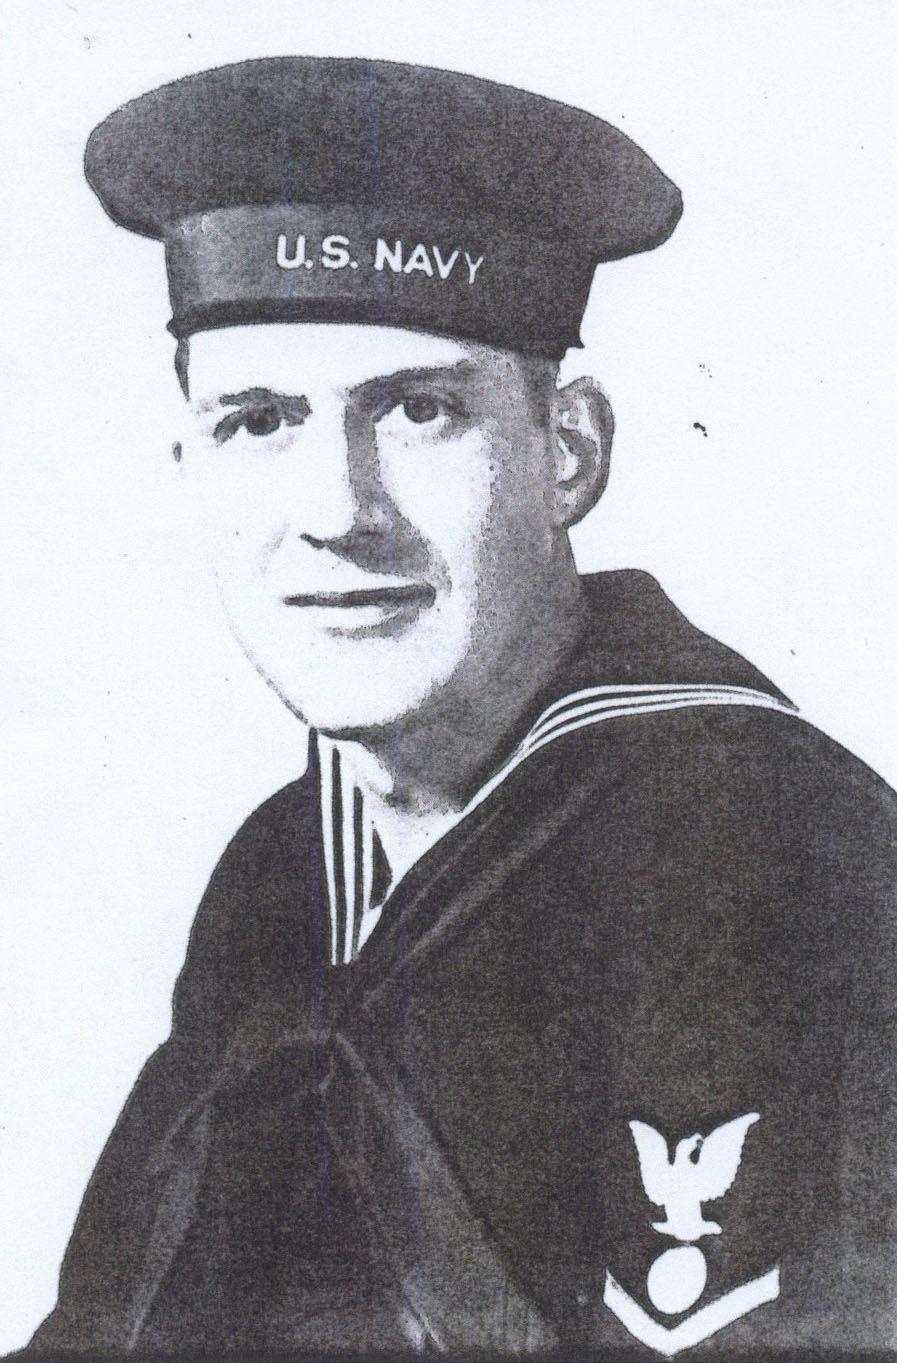 Lester Helmick - May 1942